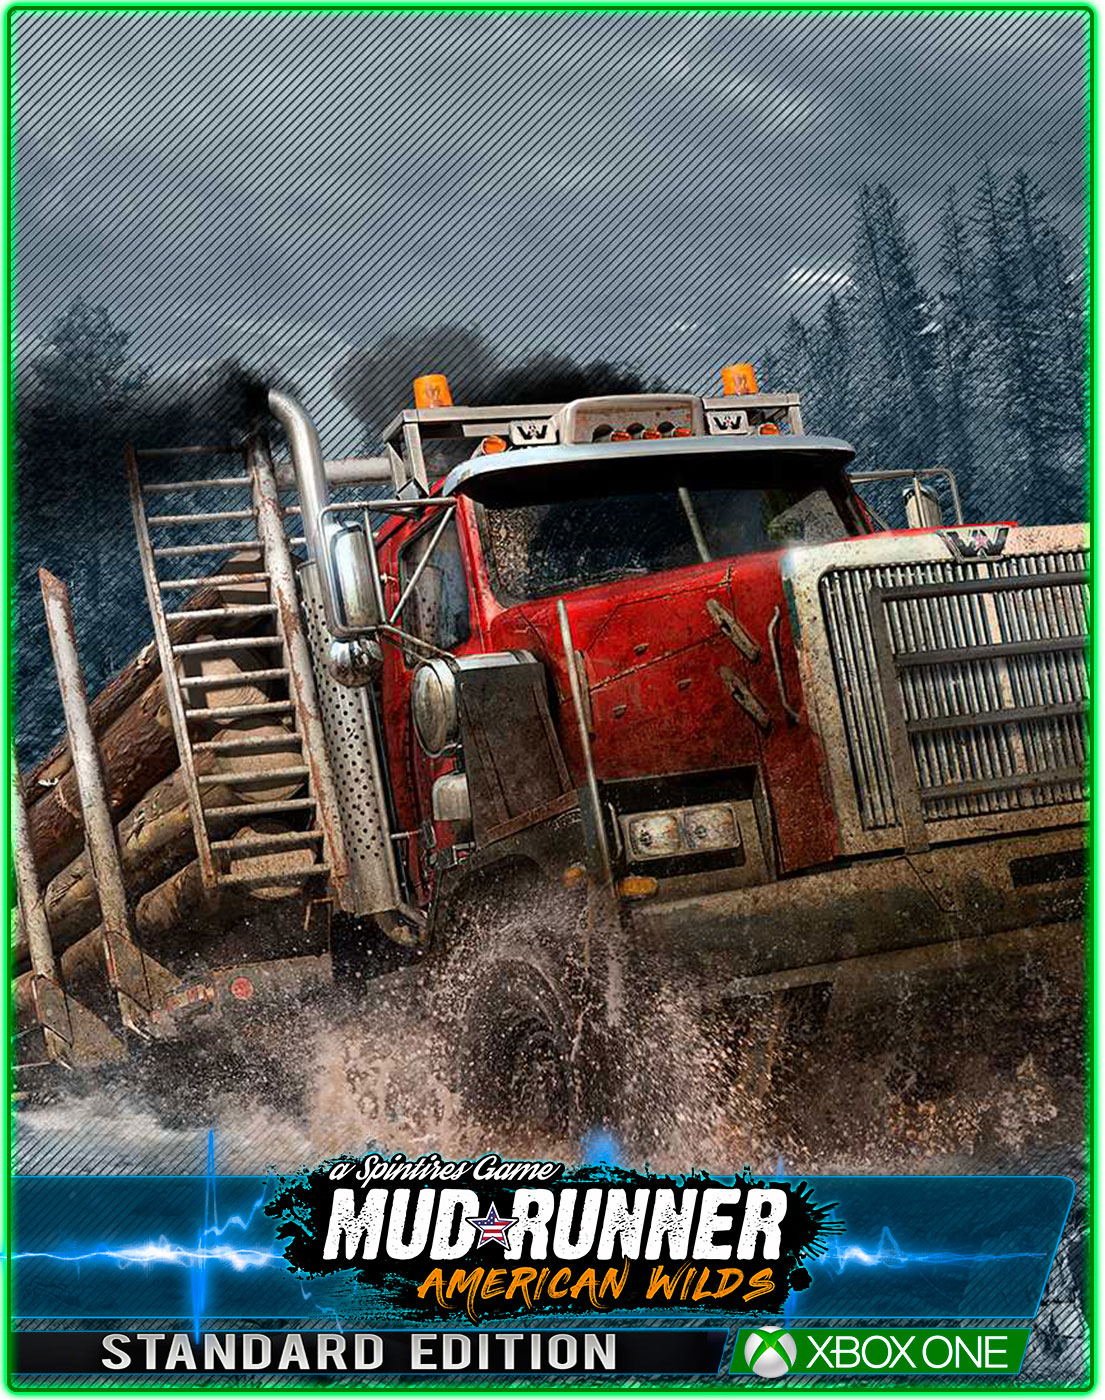 MudRunner American Wilds Edition(XBOX ONE) 2019